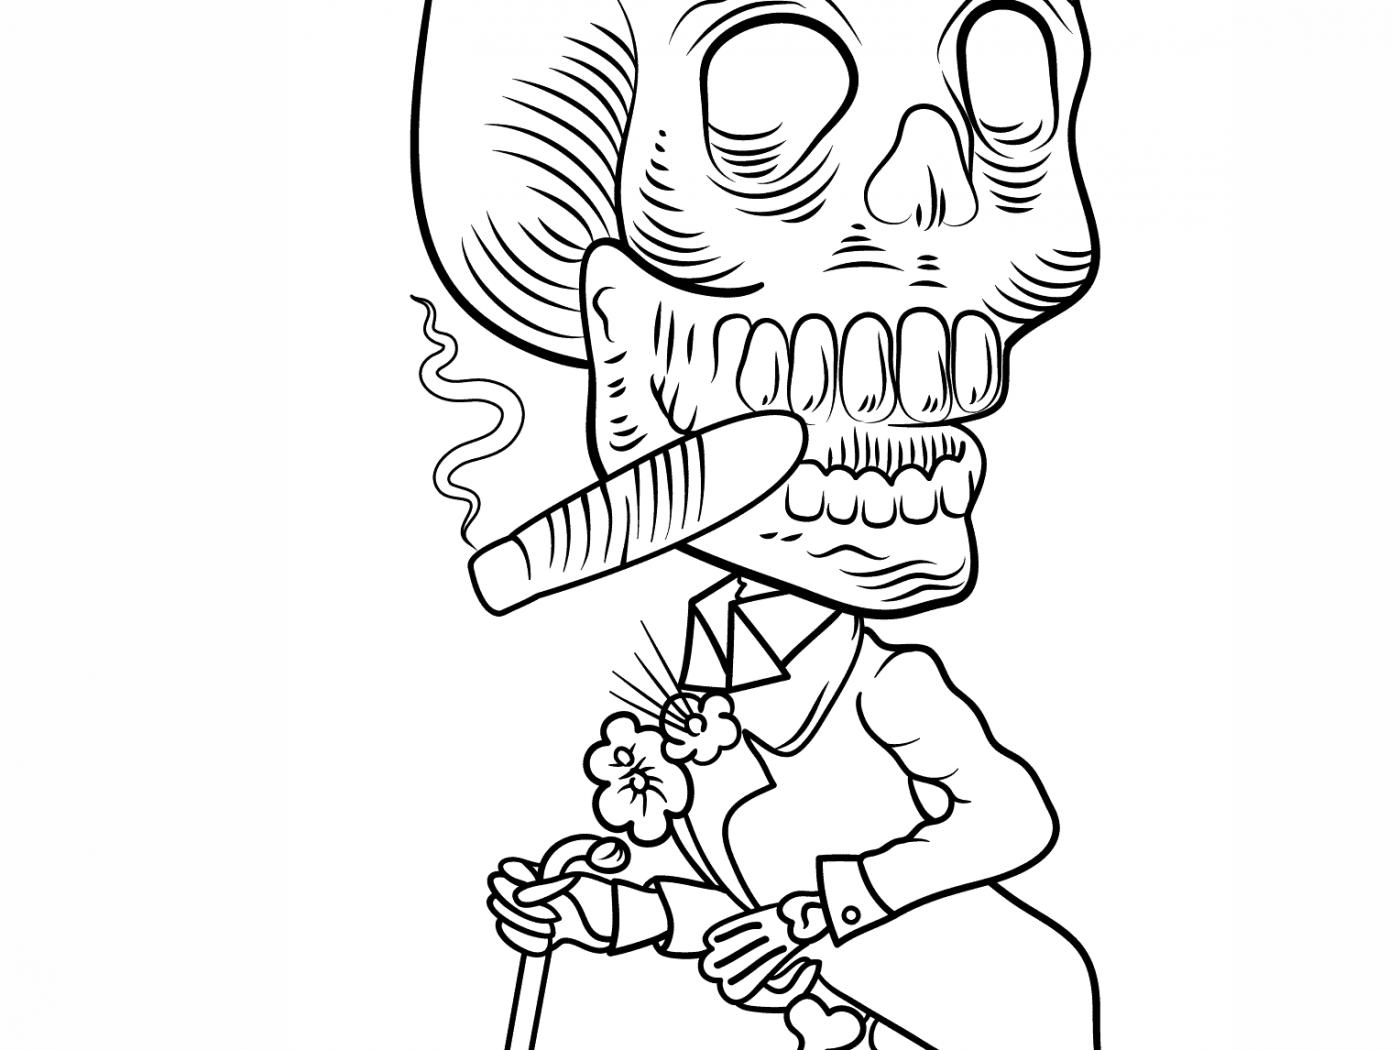 human head anatomy drawing at getdrawings com